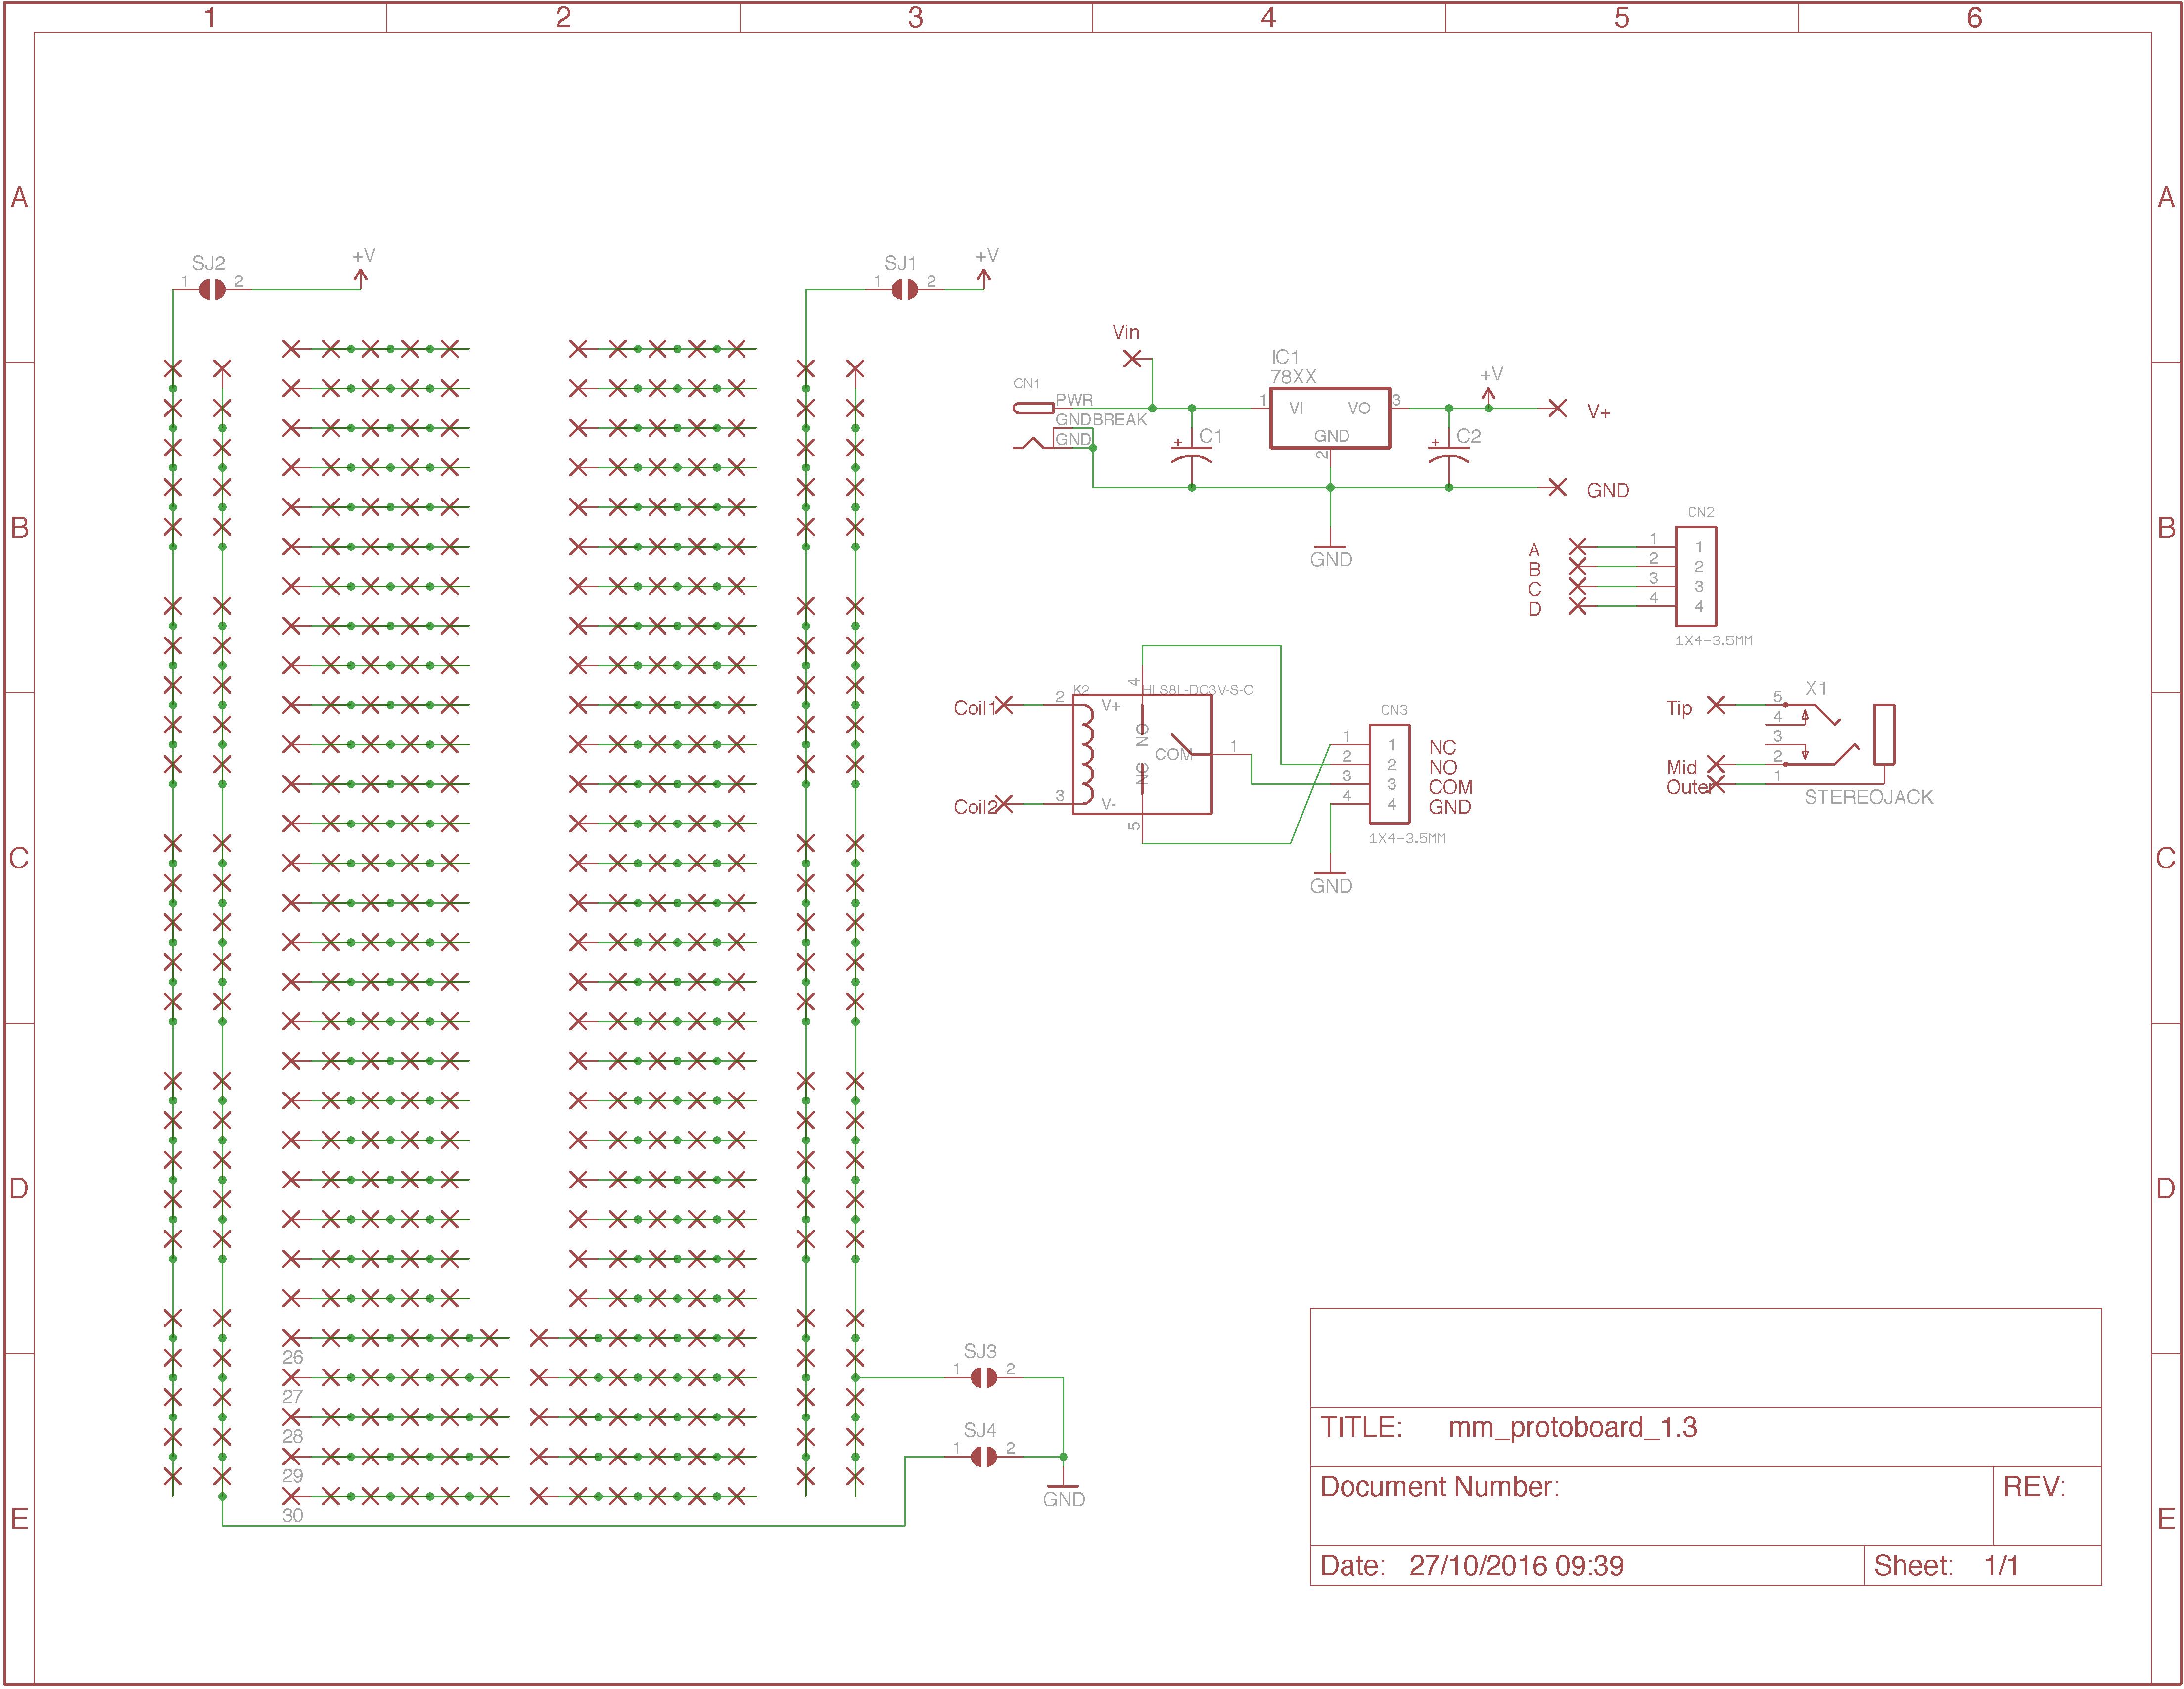 mm_protoboard_1.3